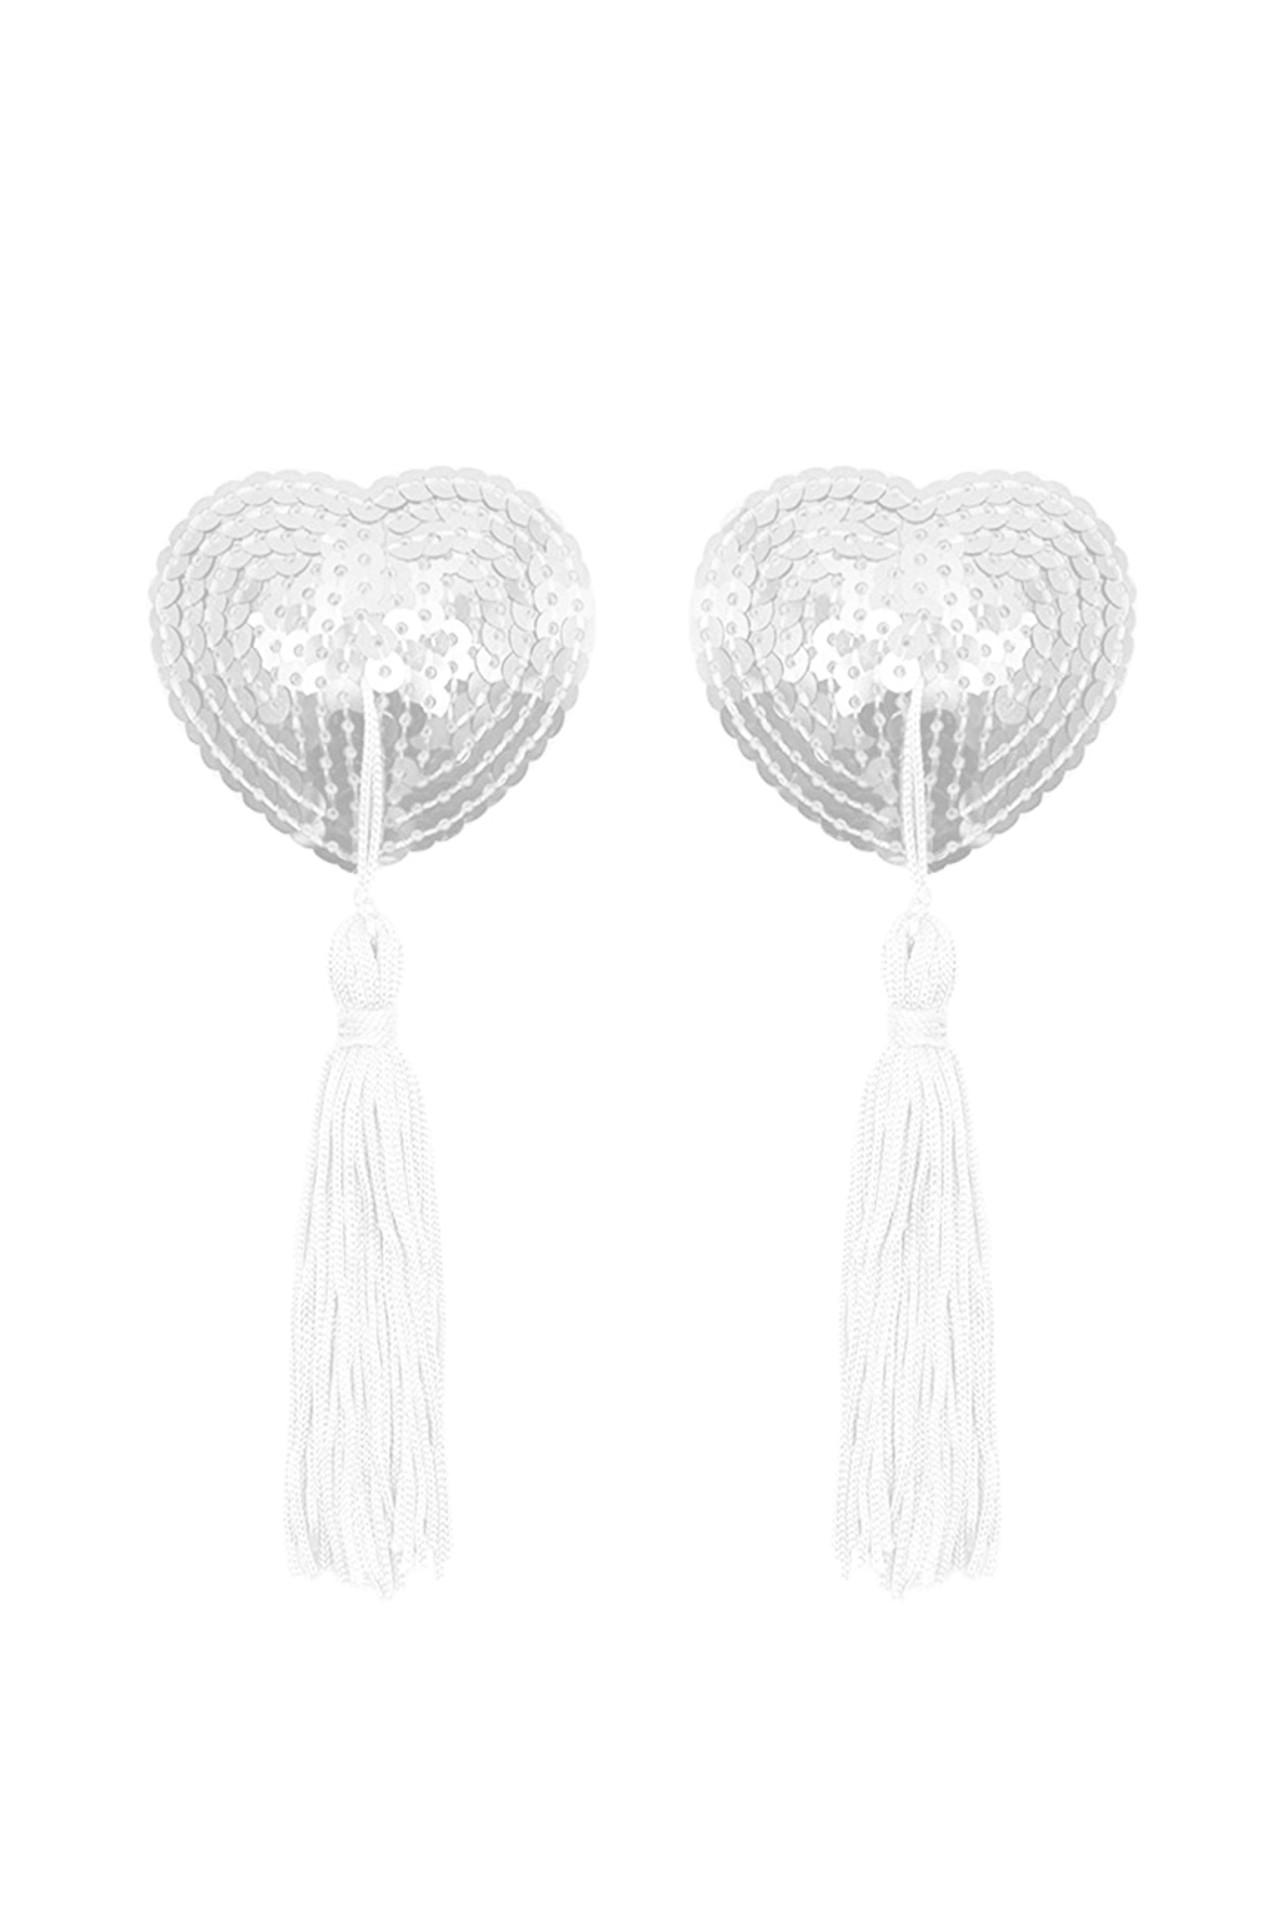 White Heart Sequin Nipple Tassel Pasties